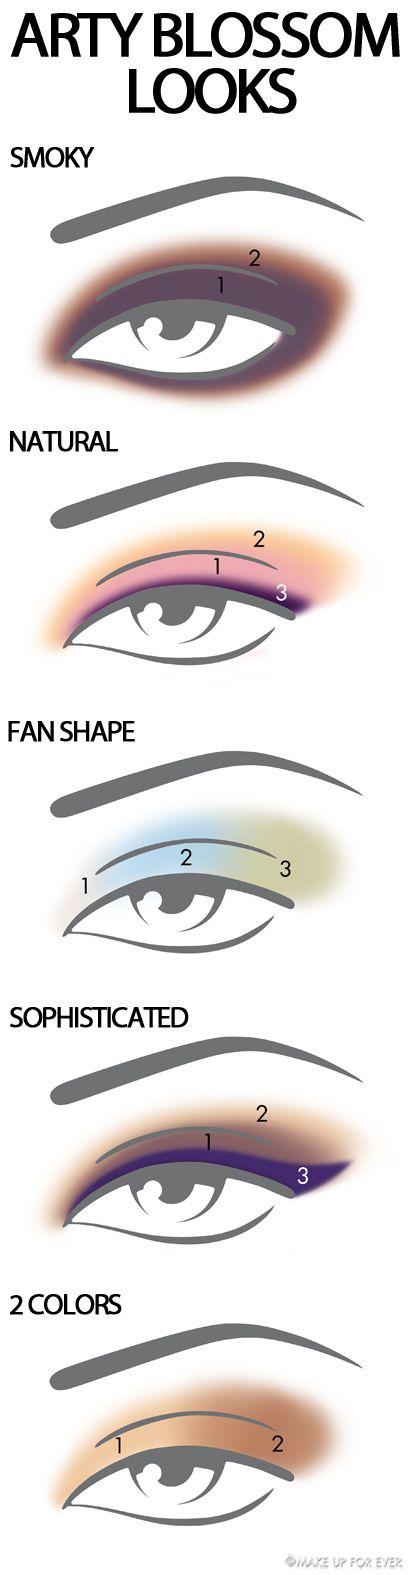 Eye makeup shapes